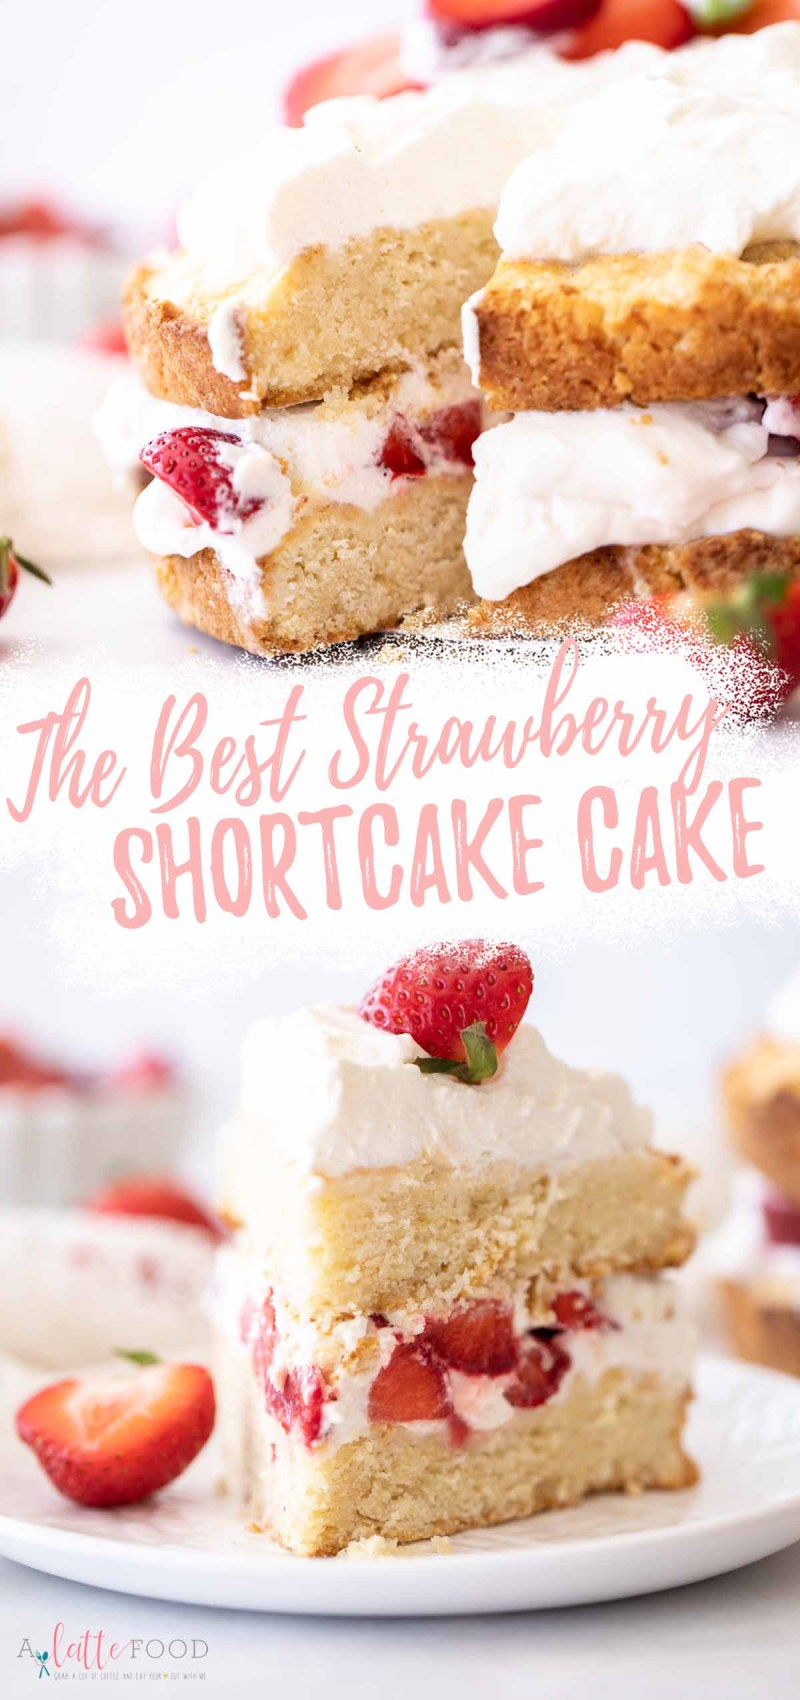 best strawberry shortcake cake slices on white plates